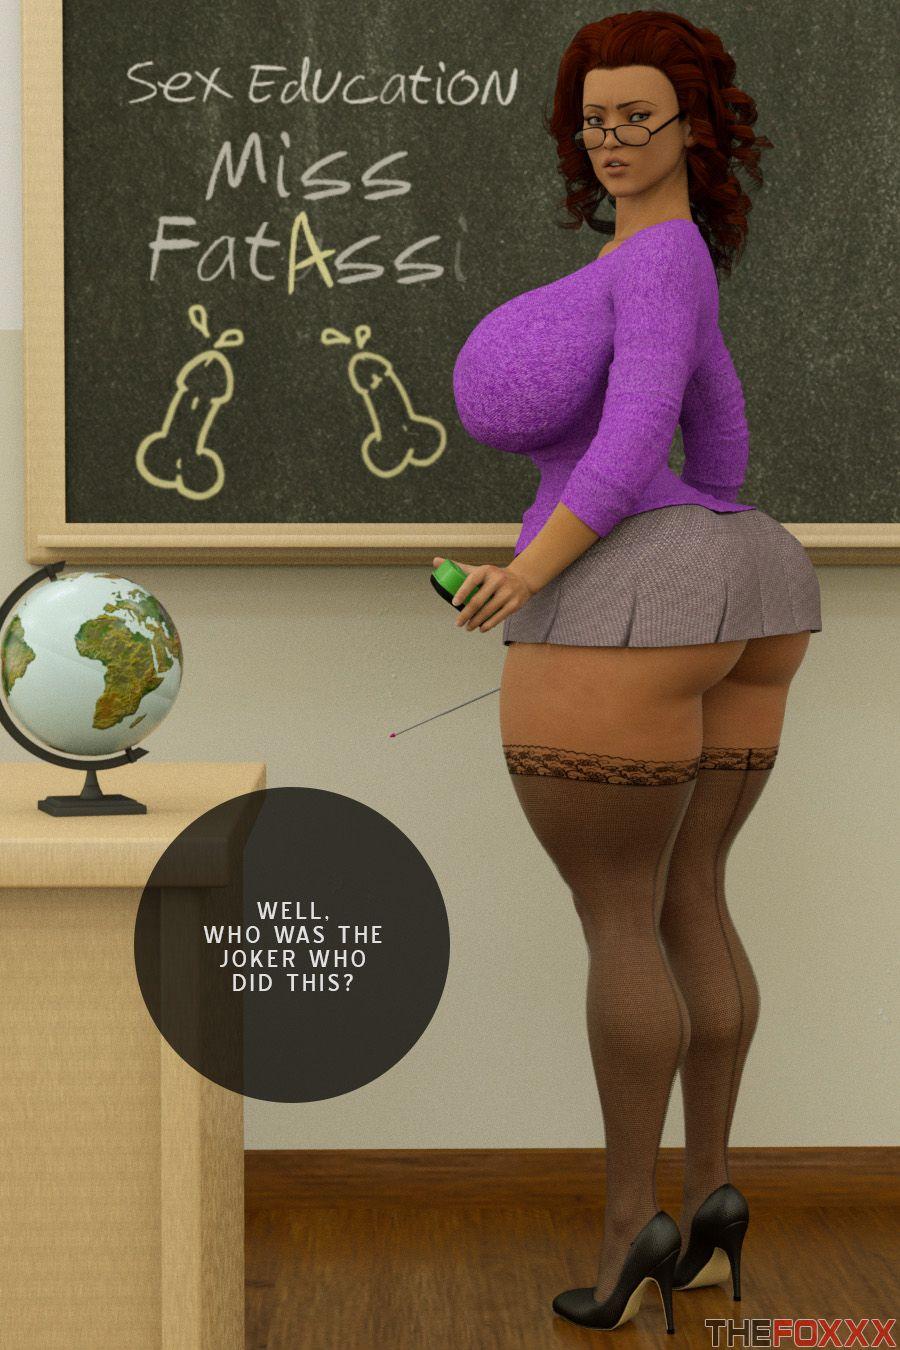 Azalea-Fatassi  Dibujos Simples, Desnudos, Dibujos-5086